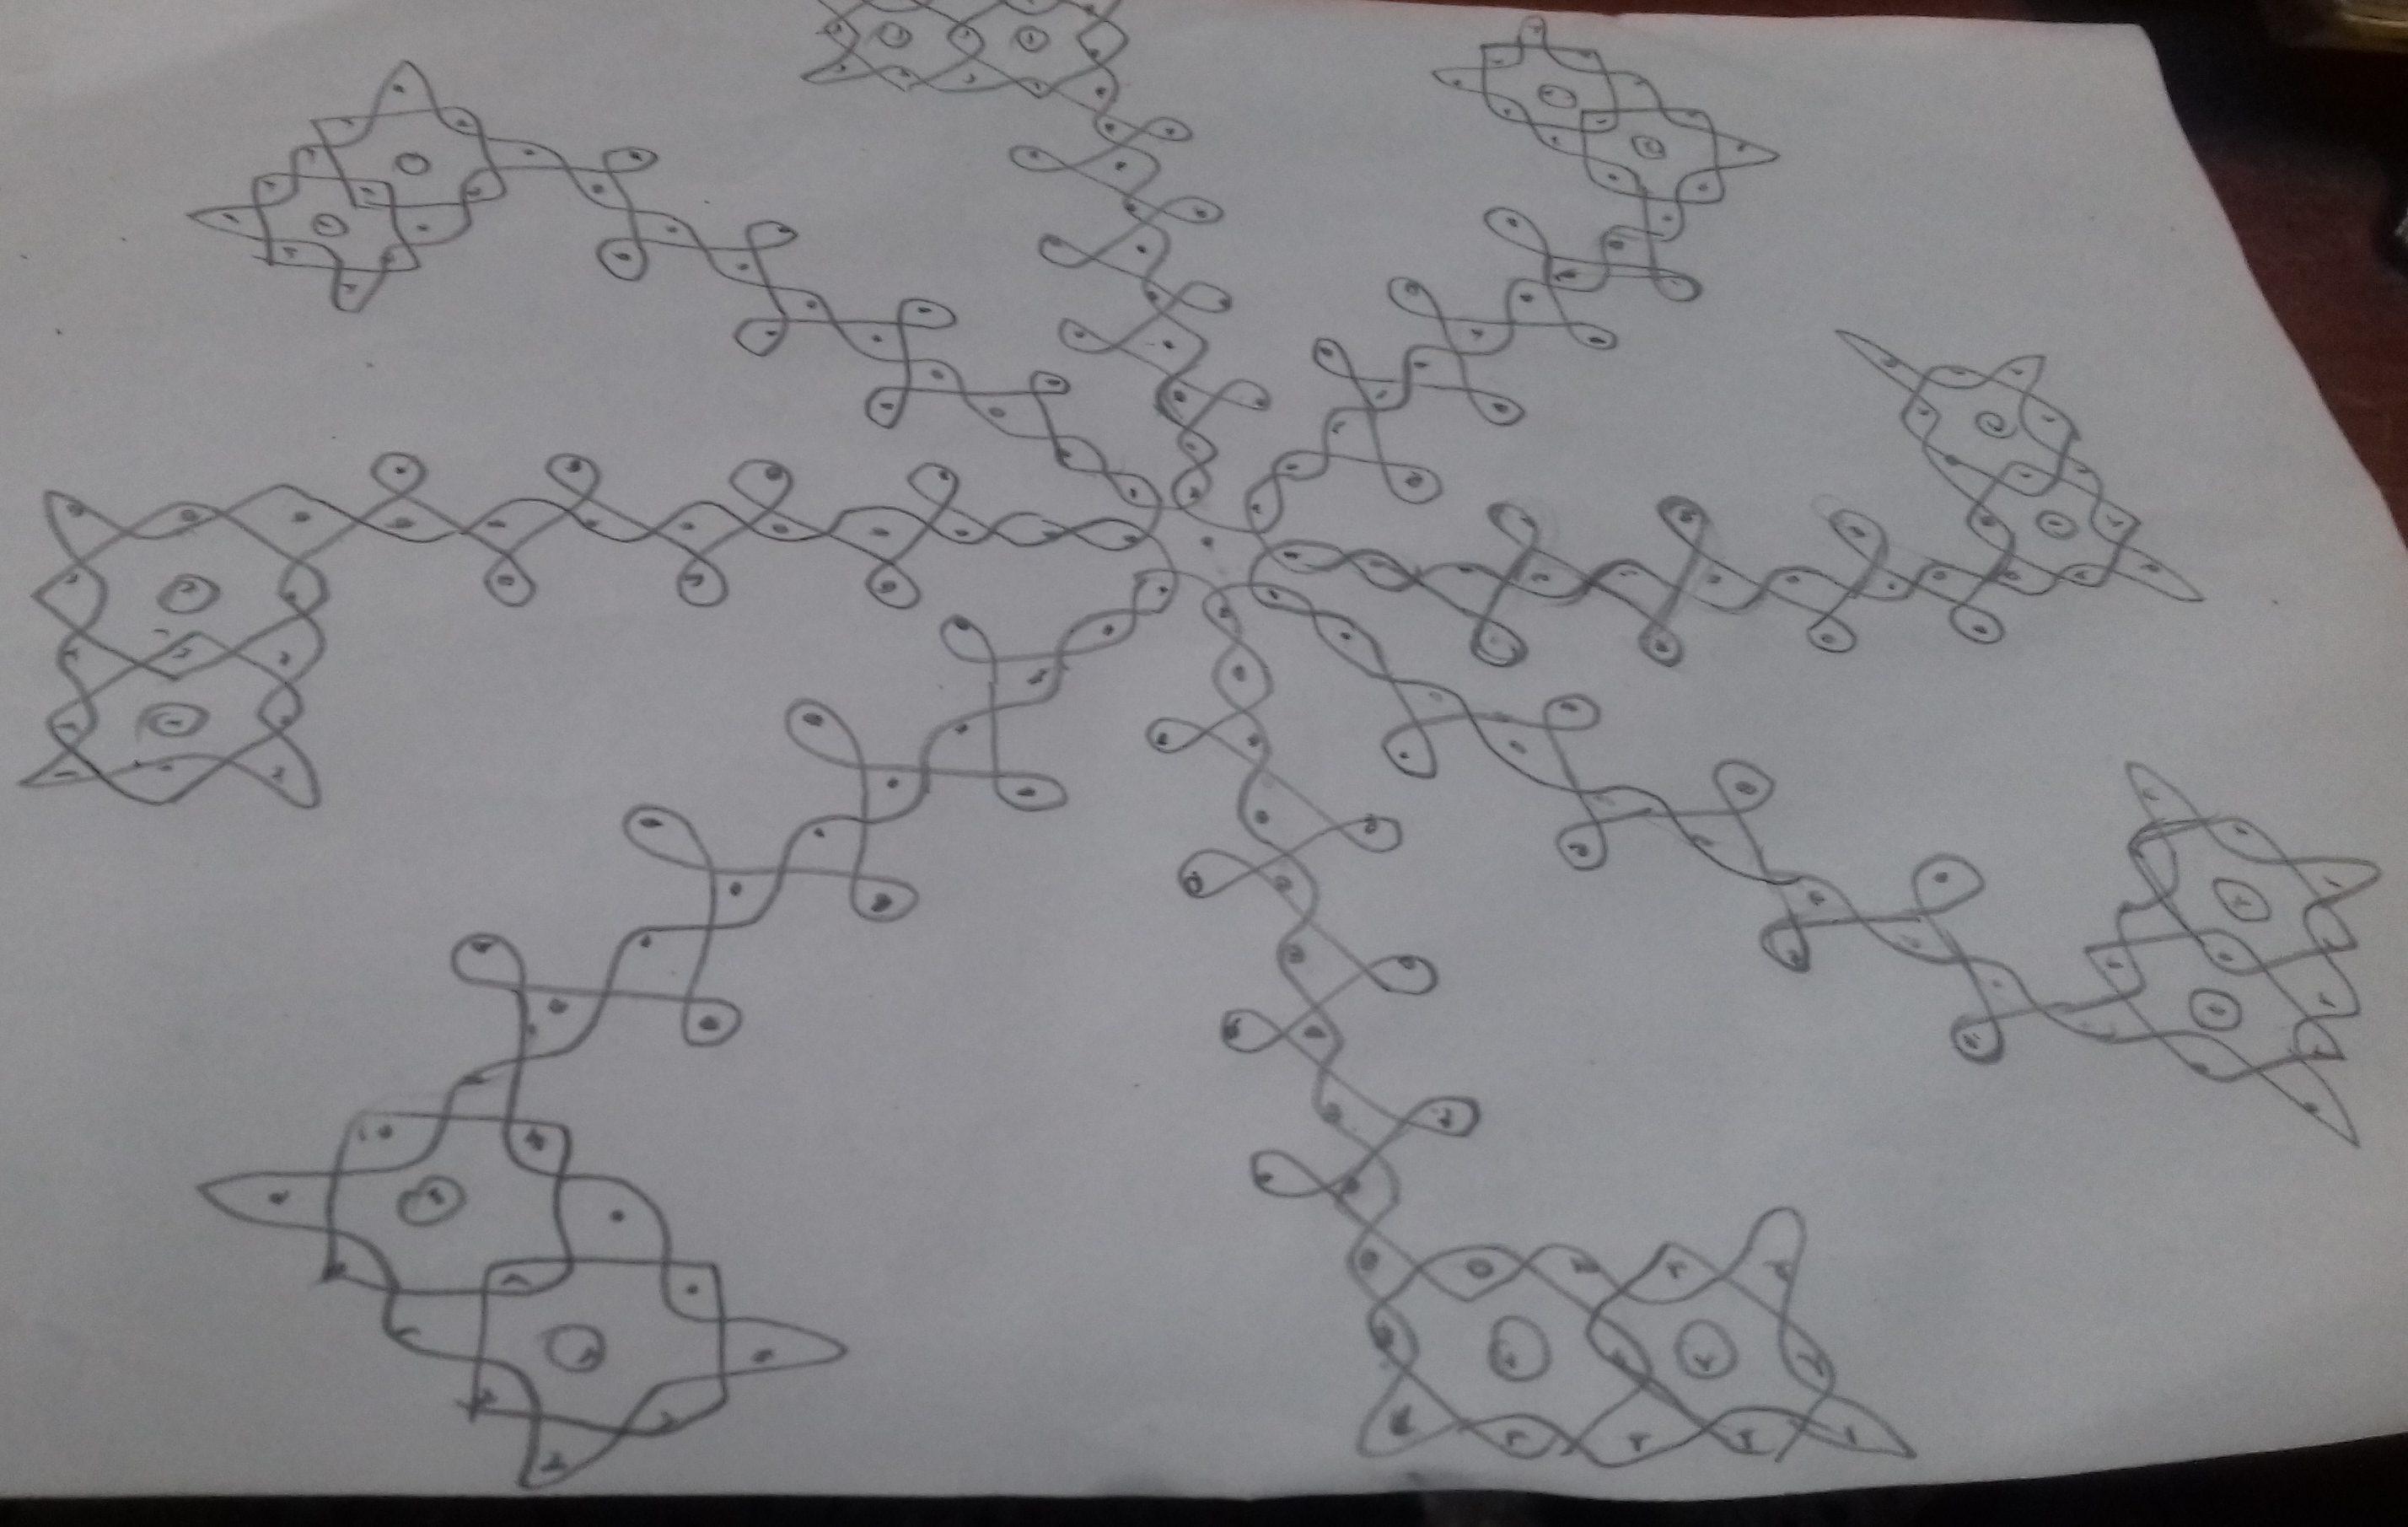 chikku kolam || 25 dots Contest sikku kolam